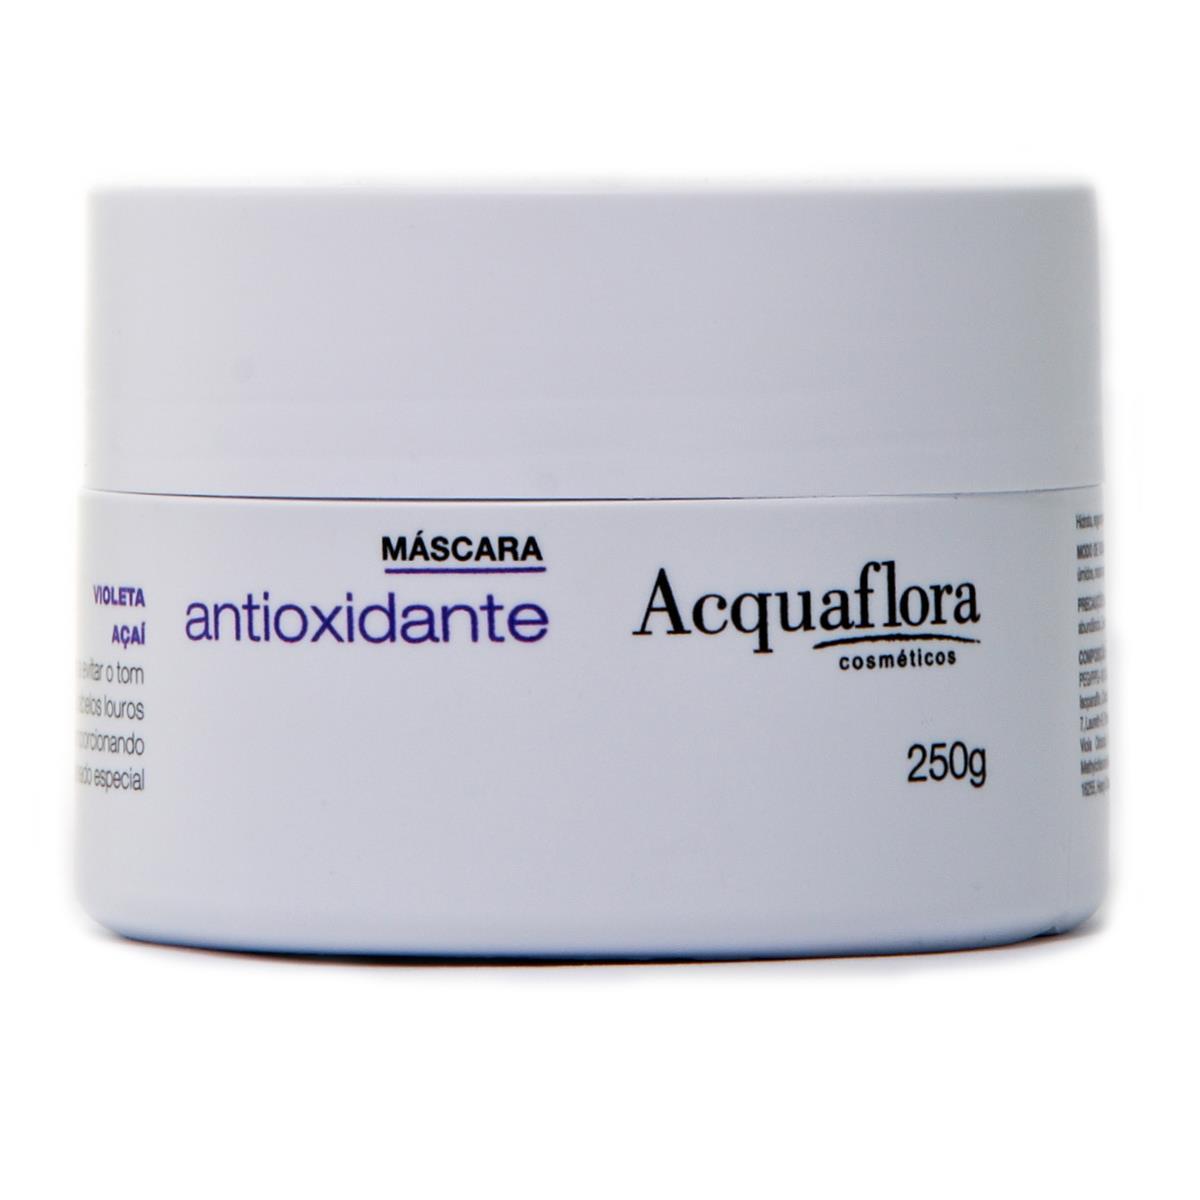 MÁSCARA ANTIOXIDANTE ACQUAFLORA - 8 Melhores produtos para cabelos loiros